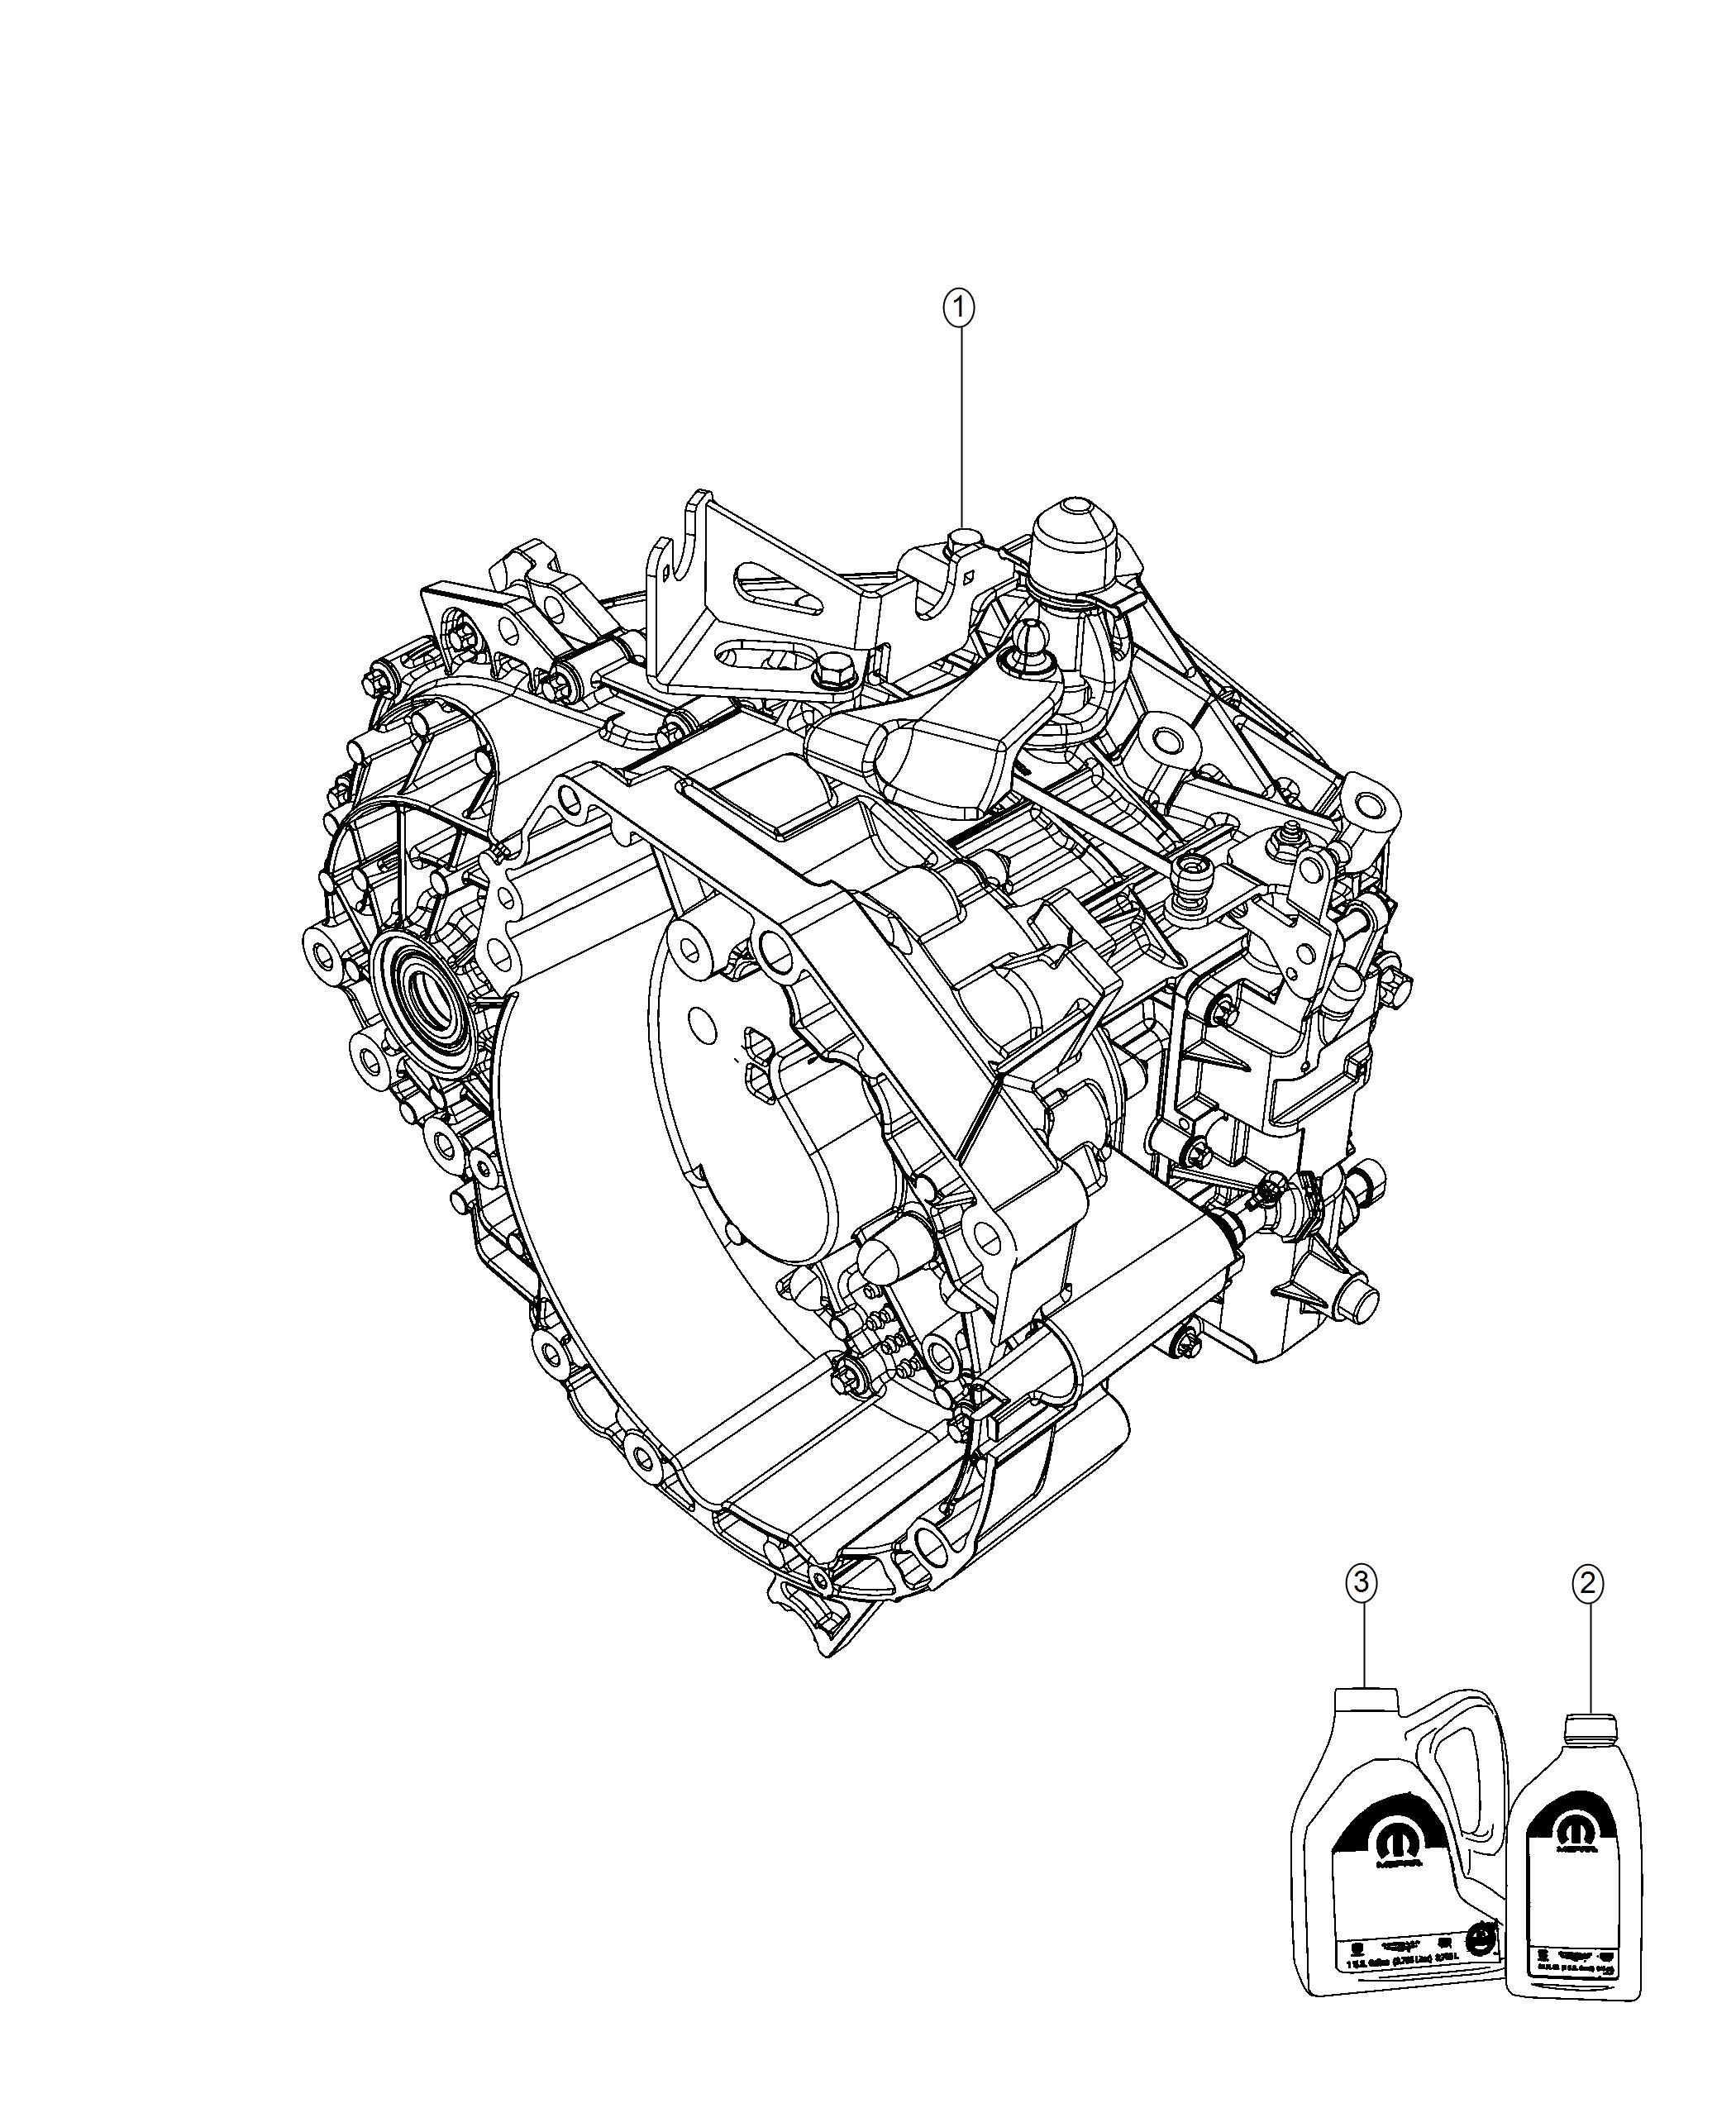 2018 Jeep Renegade Fluid. C series transmission, c635